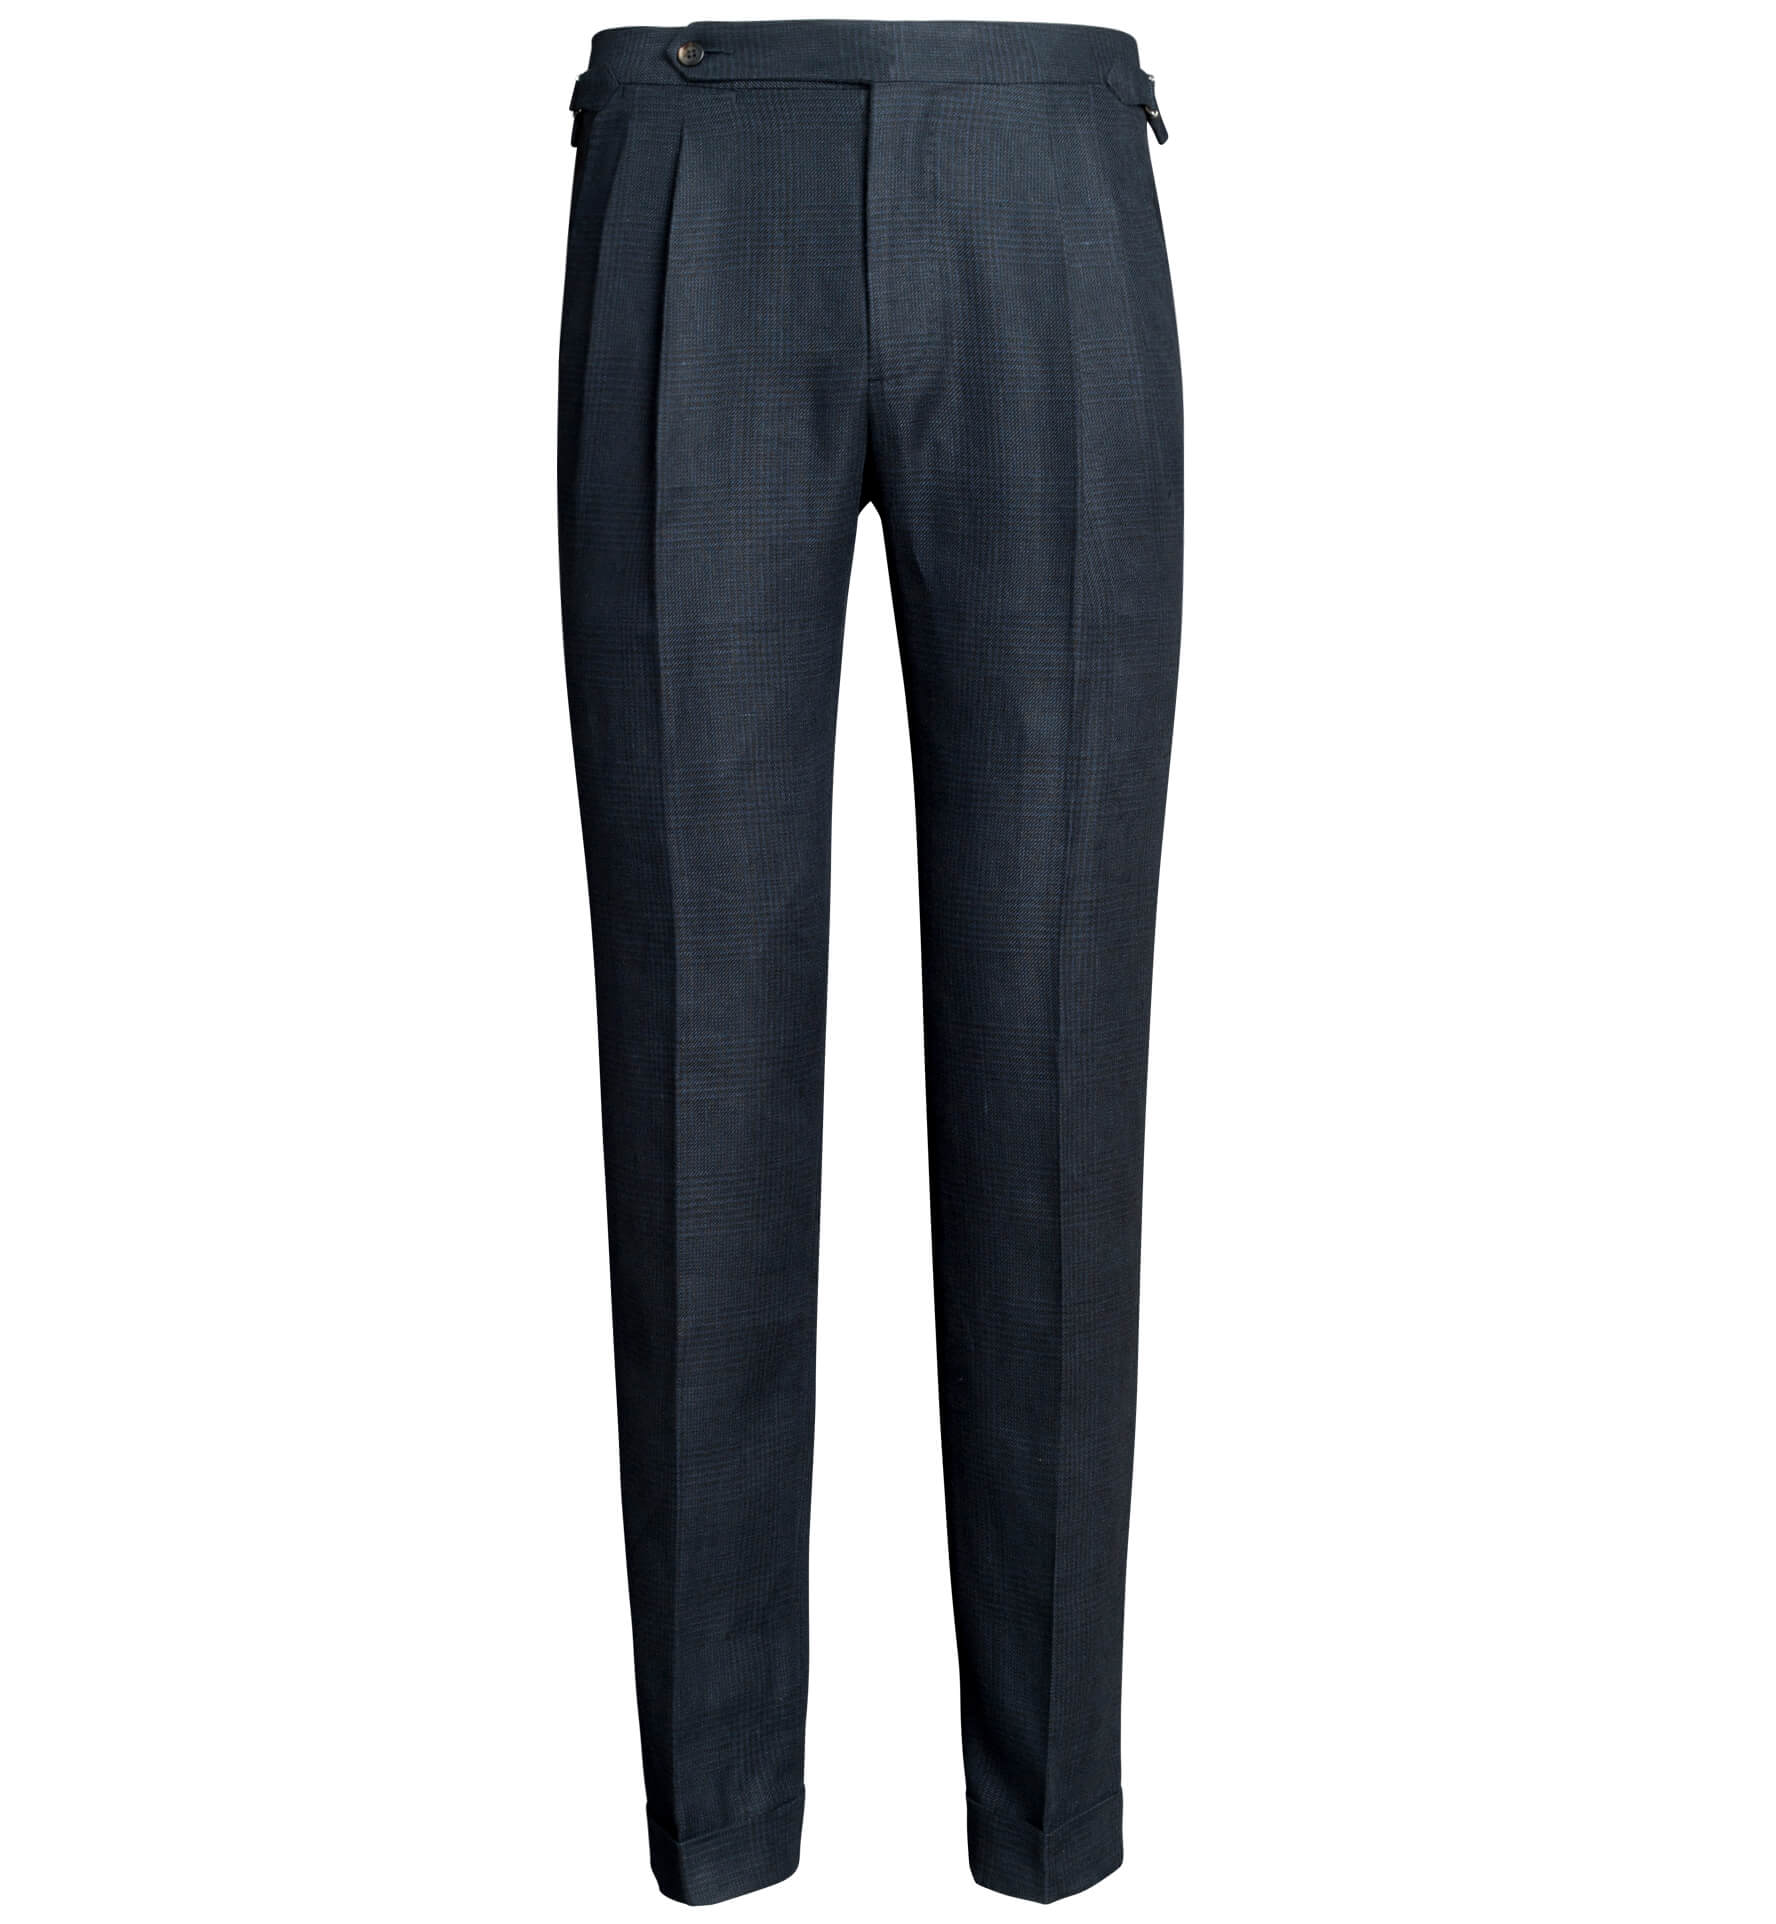 Zoom Image of Allen Navy Glen Plaid Irish Linen Pleated Trouser